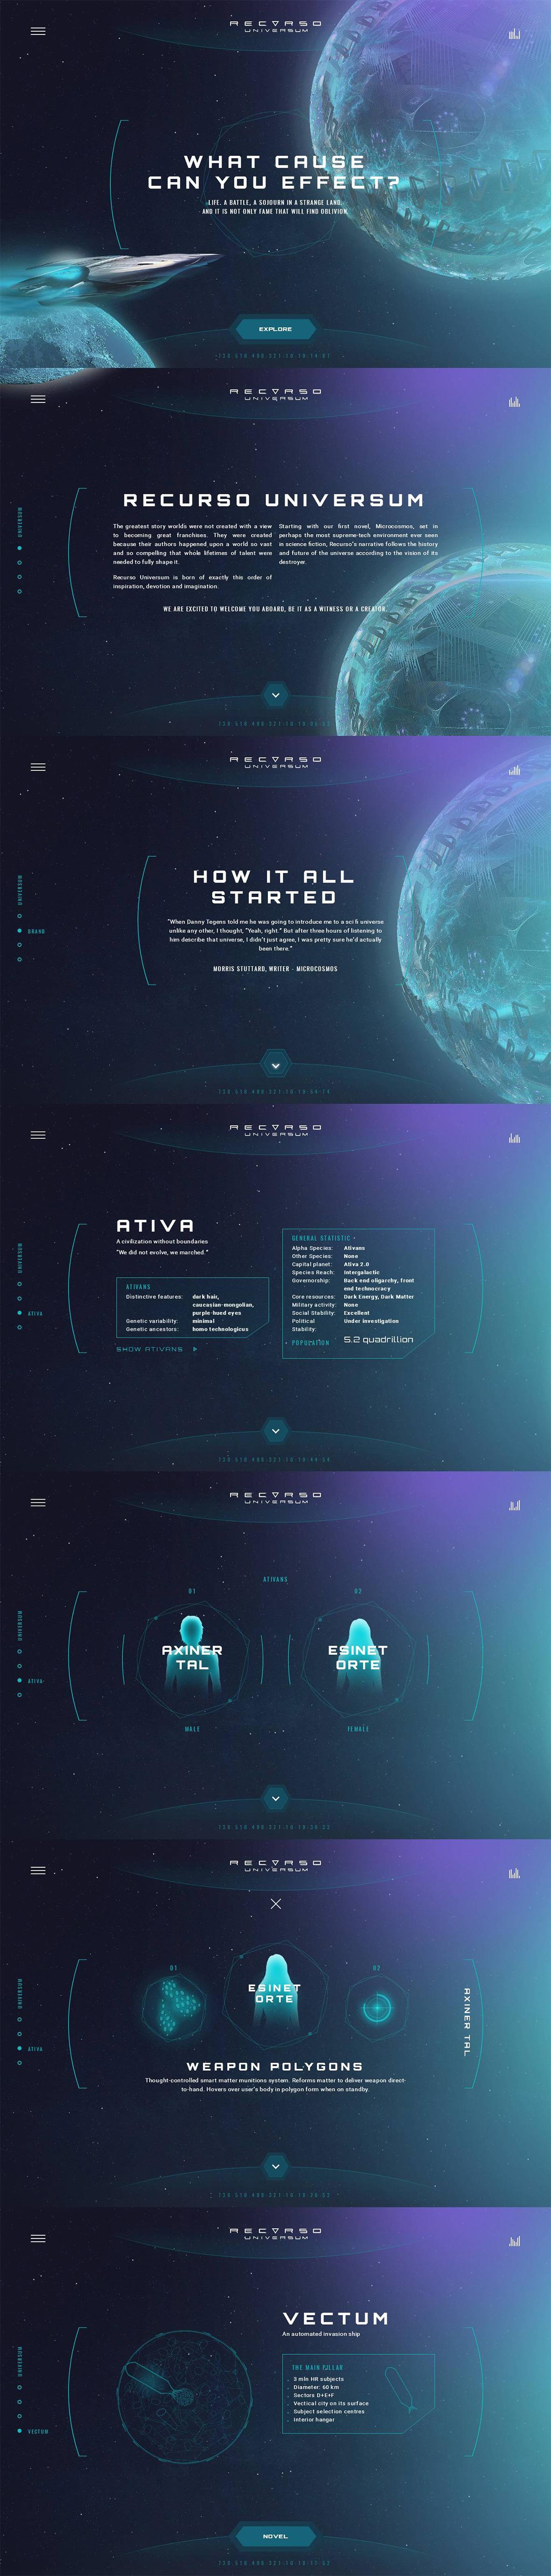 quantified planet  -创意,网页设计,创意设计,创意网站,字体设计,设计网站,设计作品,网站欣赏,优,ui设计,设计,设计师,平面设计,电商设计,动漫设计,网站设计